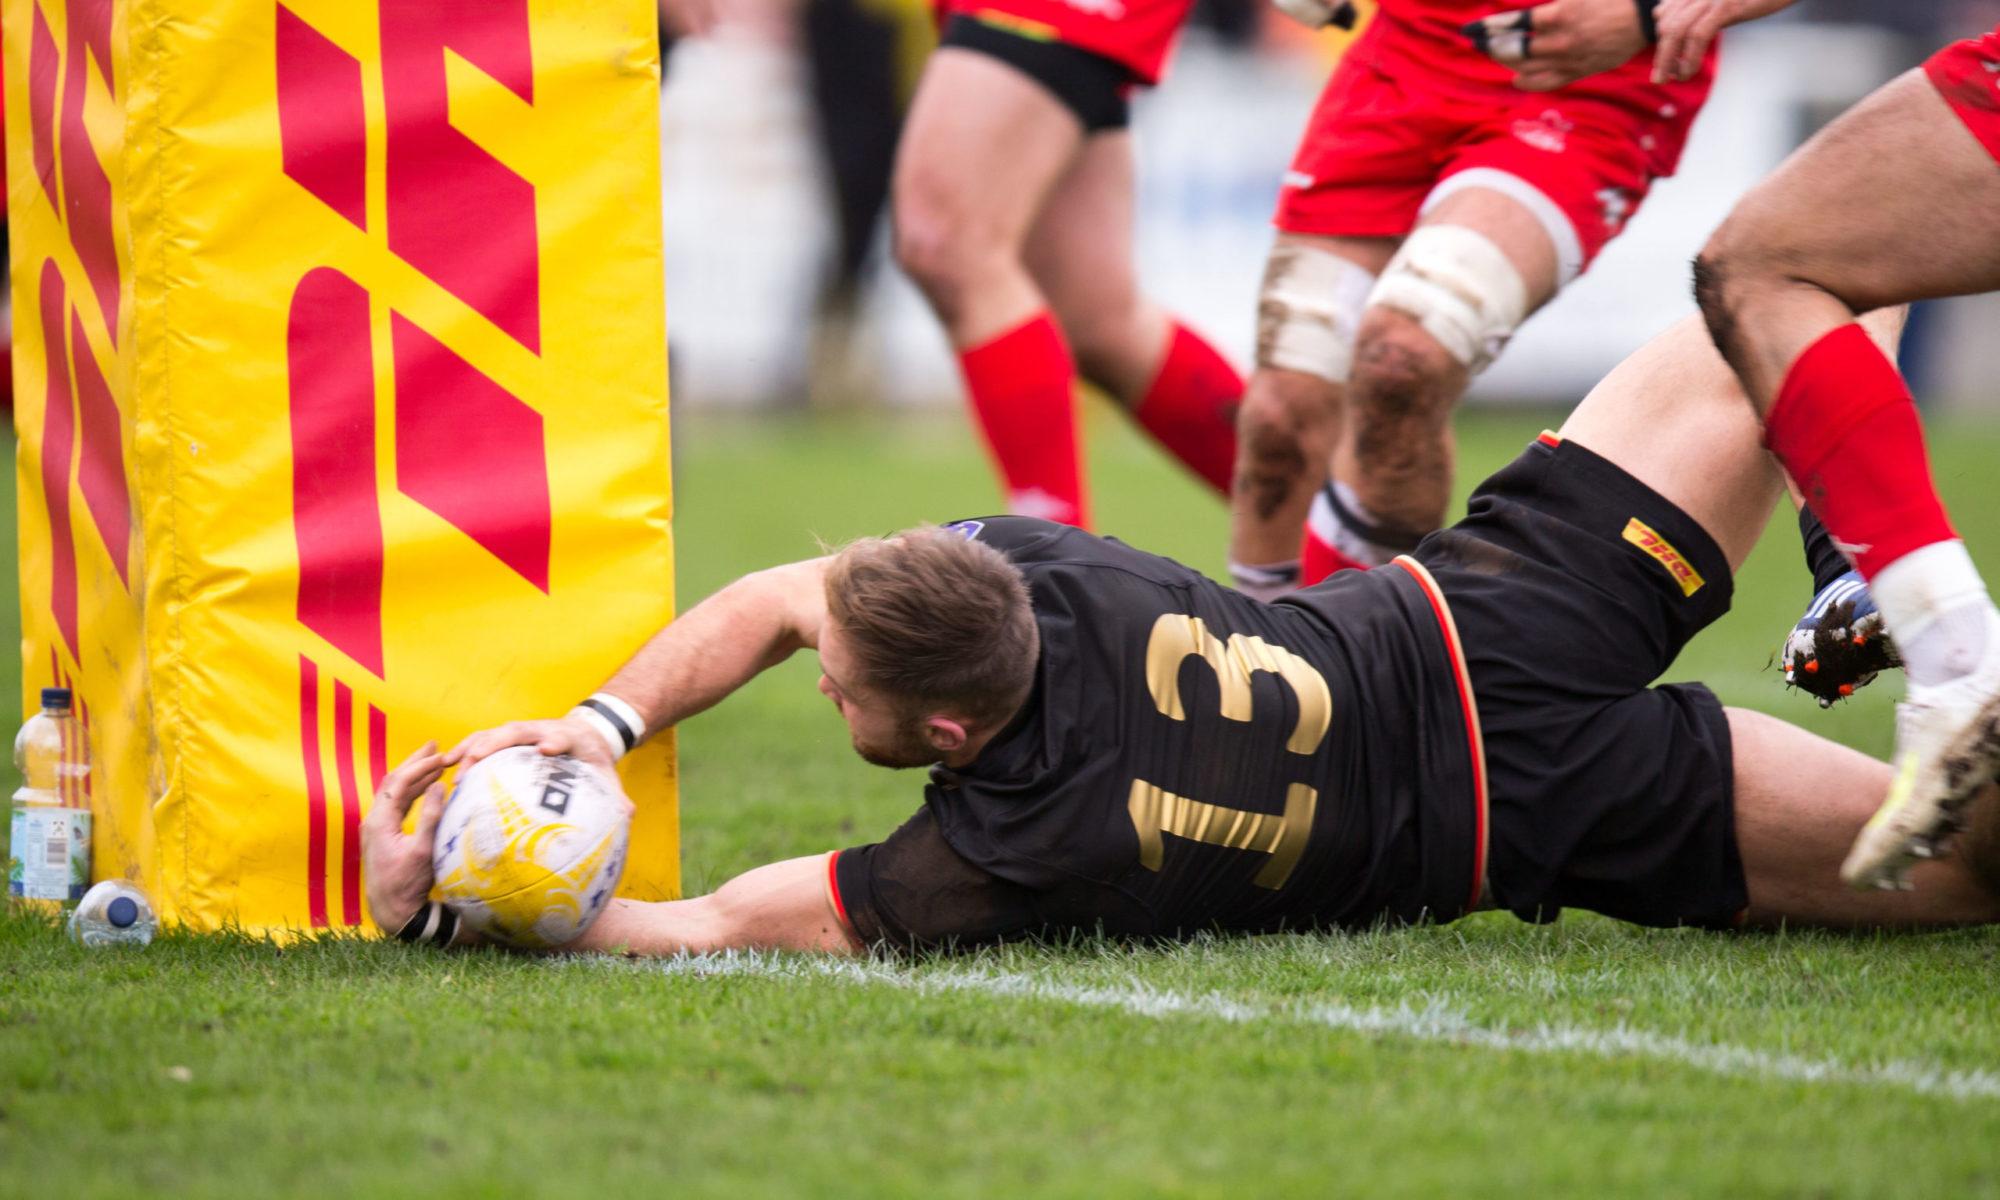 Freunde der Deutschen Rugby-Nationalmannschaft e.V.